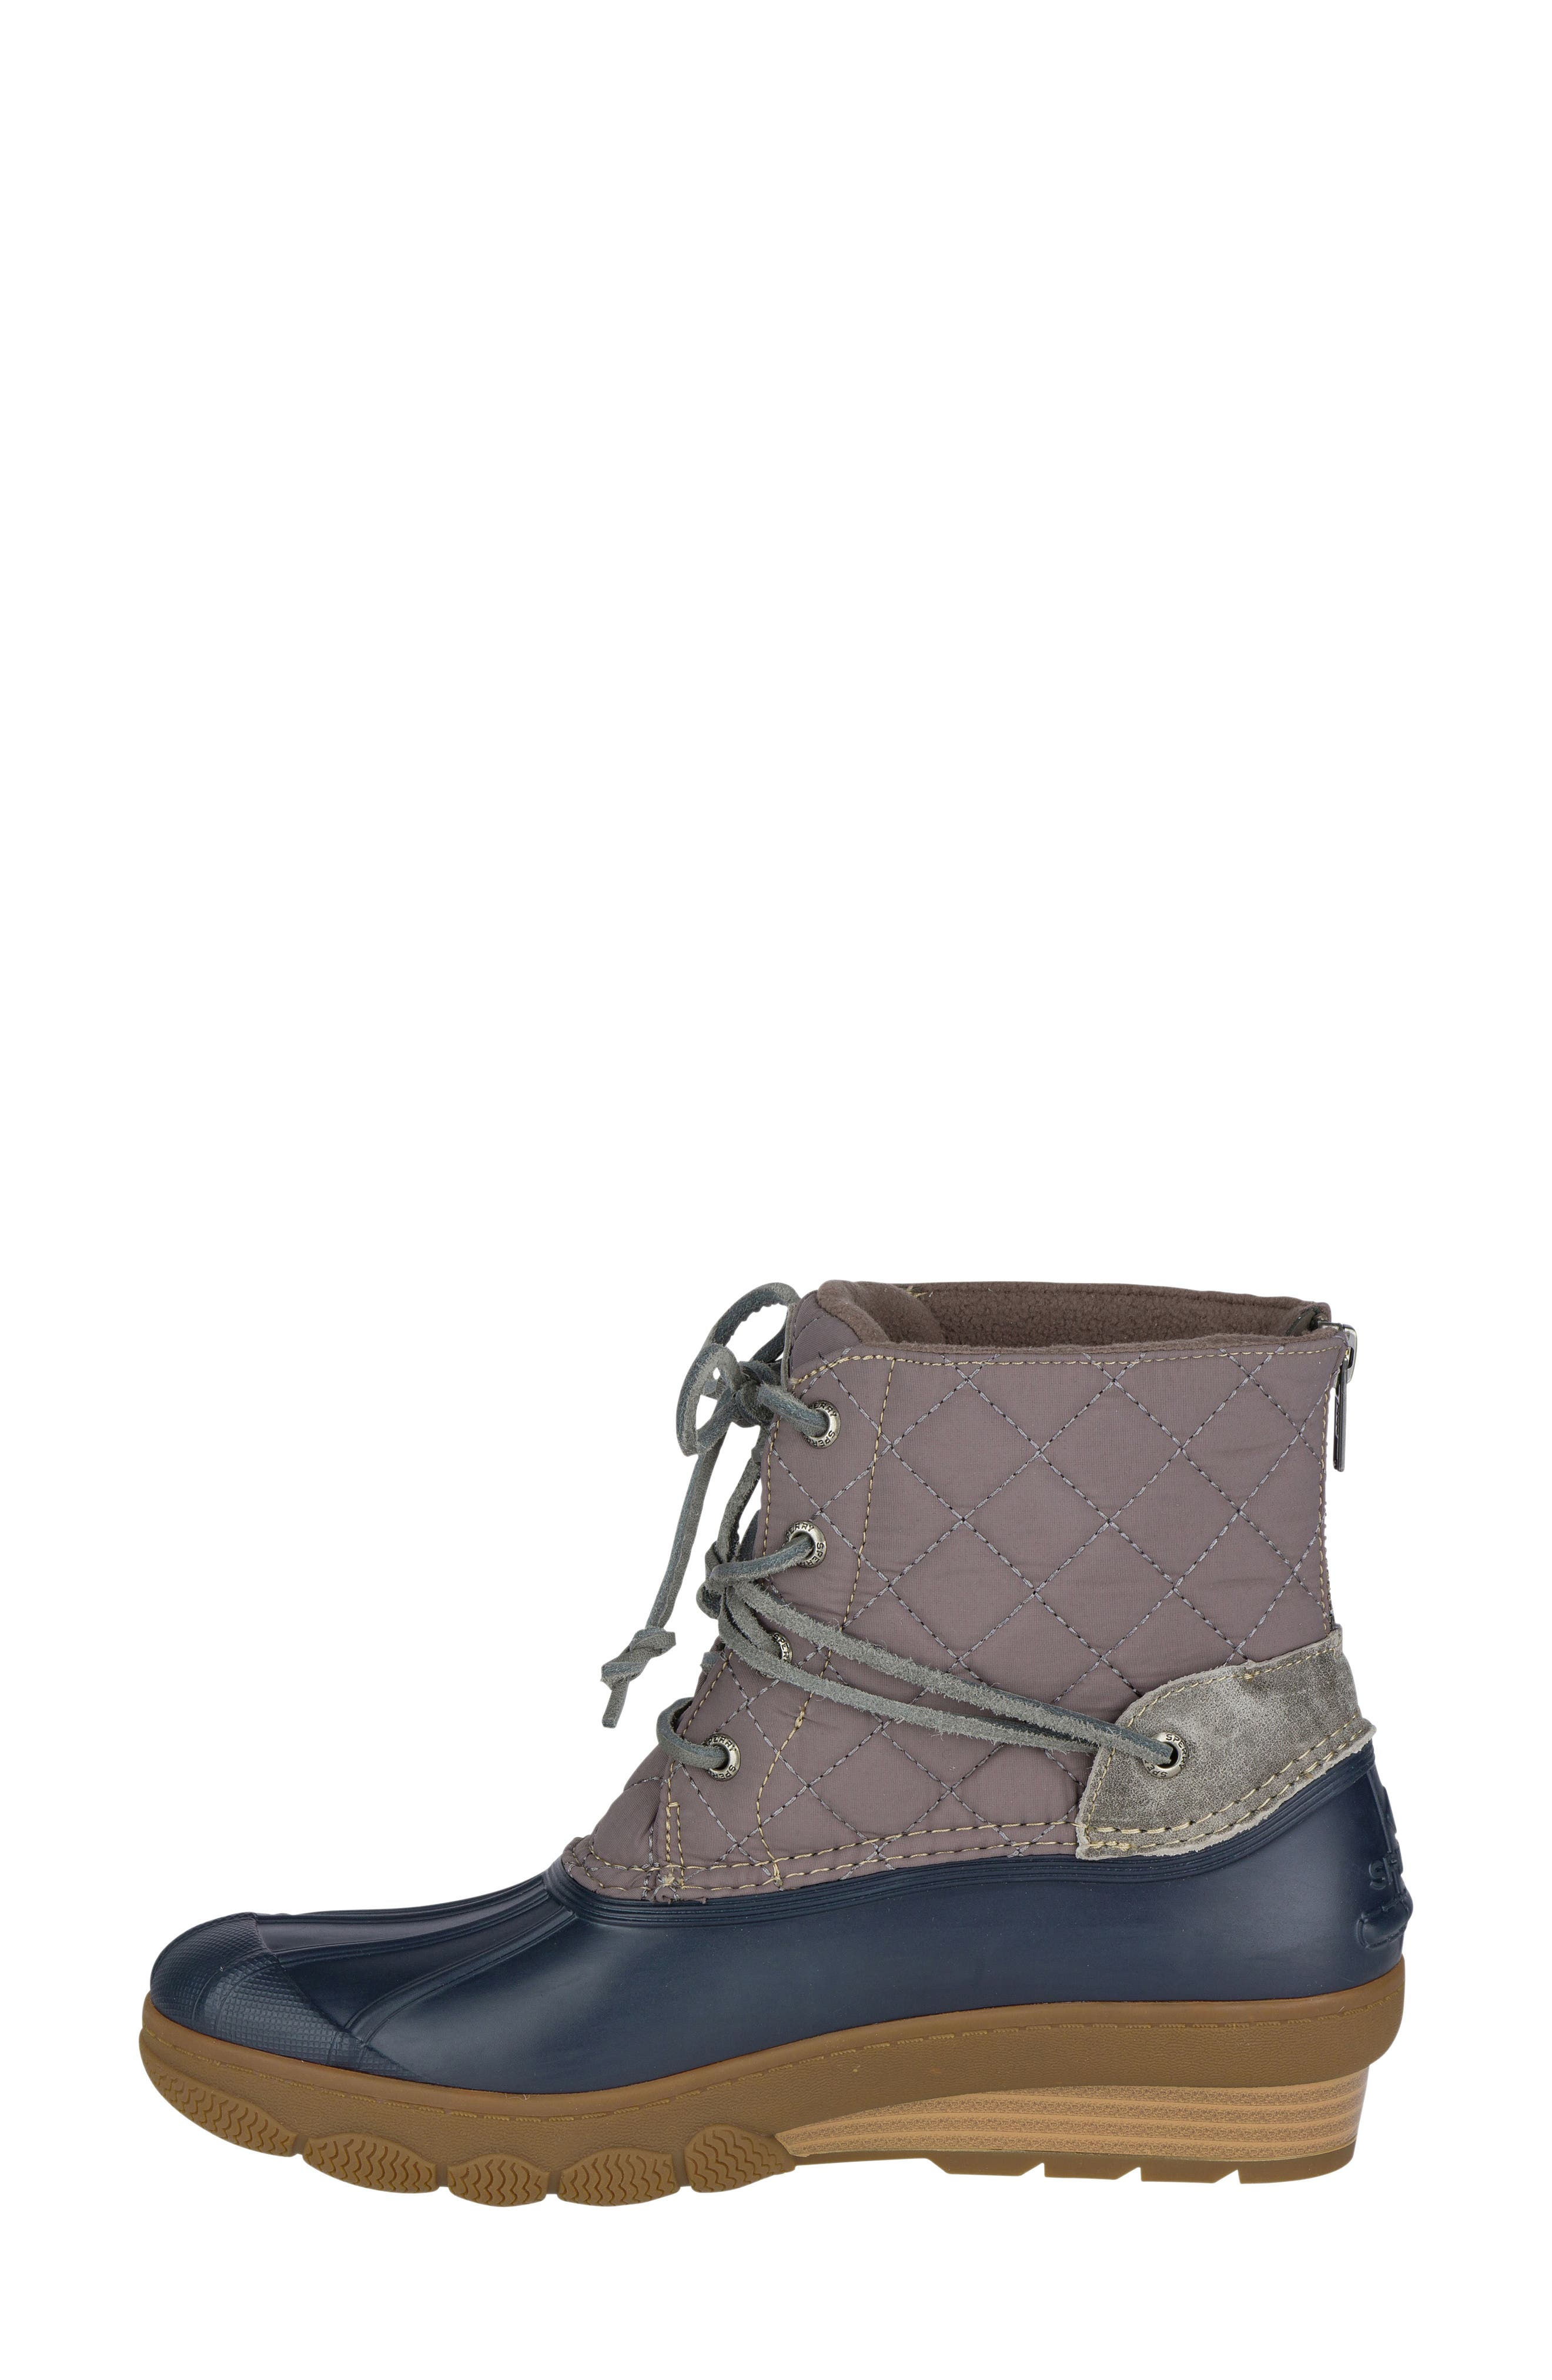 Alternate Image 3  - Sperry Saltwater Quilted Watperproof Boot (Women)